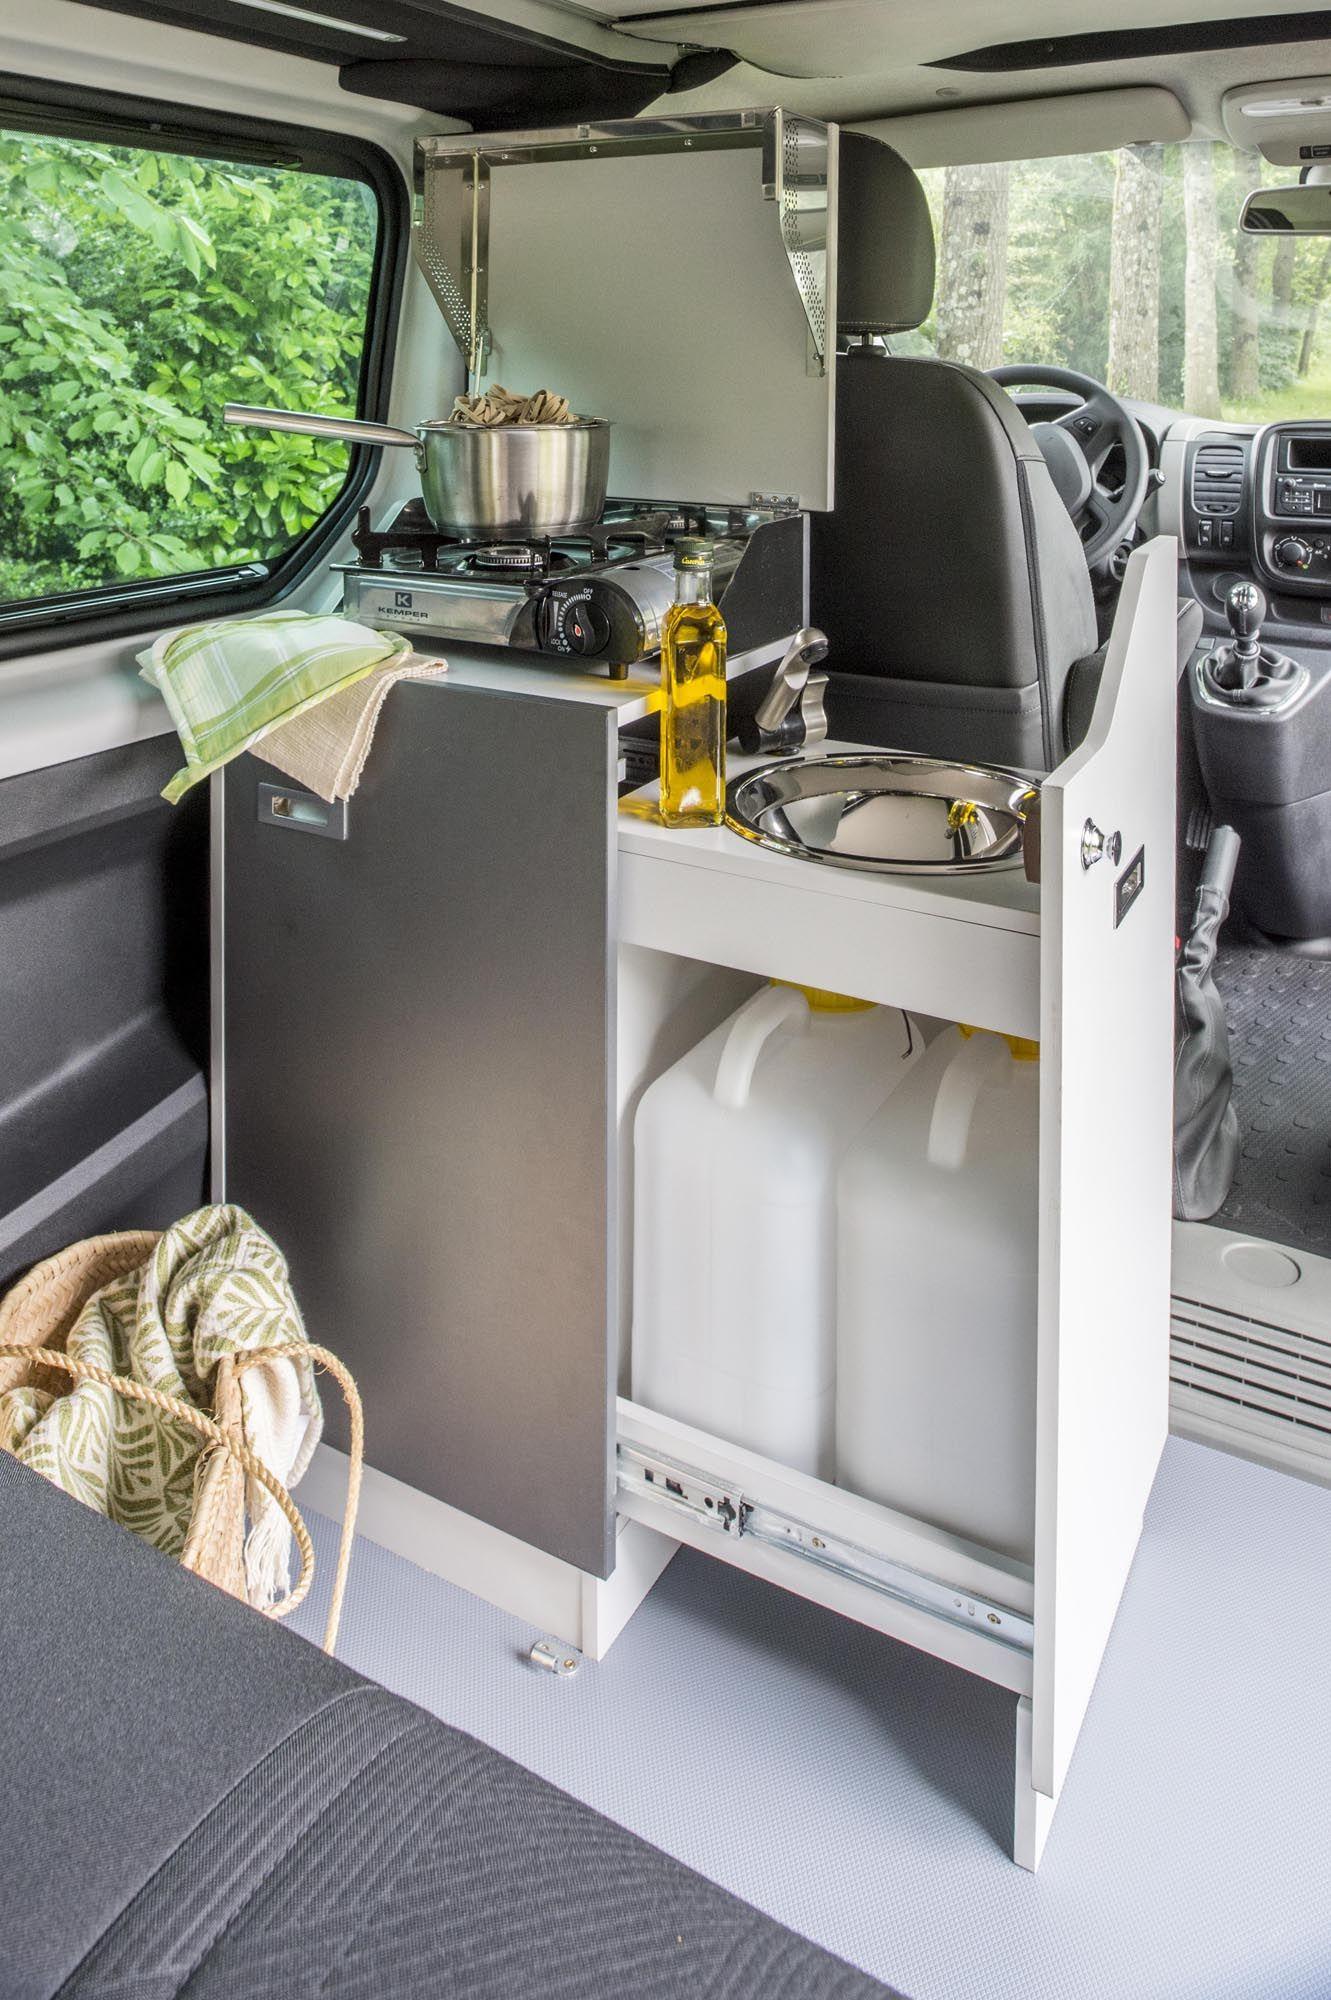 Fourgon Amenage Hanroad Trek53 Fun Cuisine Goingcamping Mini Camper Camper Van Kitchen Camper Van